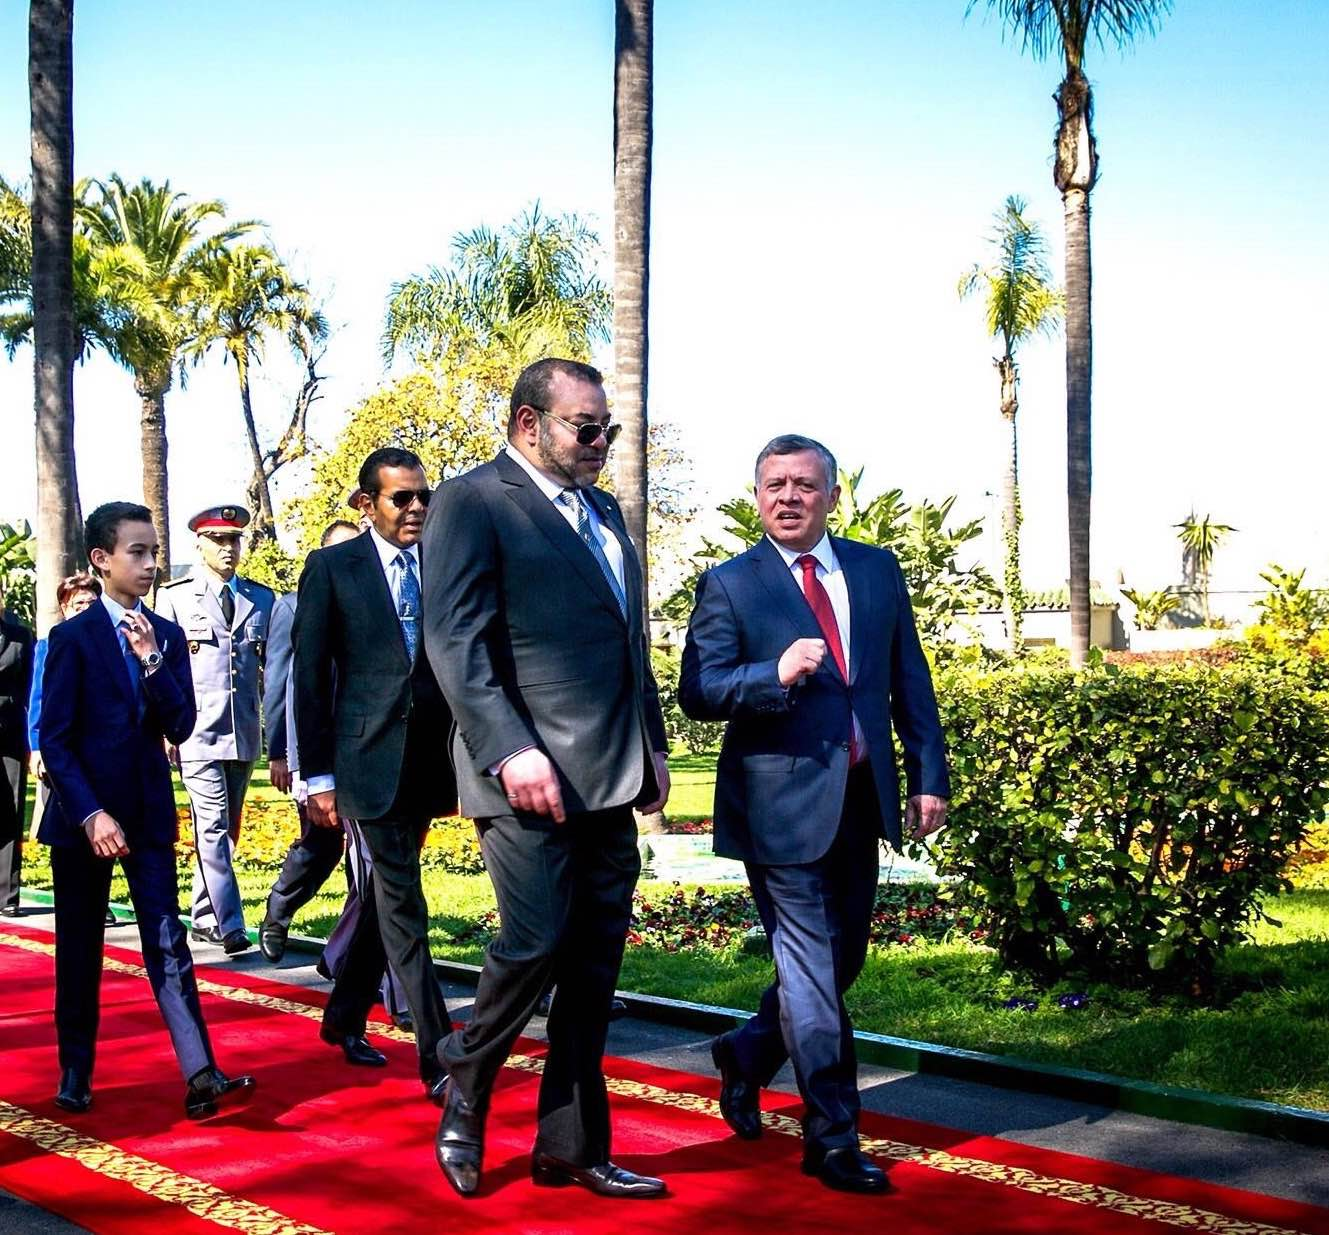 King Abdullah (R) and King Mohammed VI Jordan Morocco (L). (Al Arabiya.net)